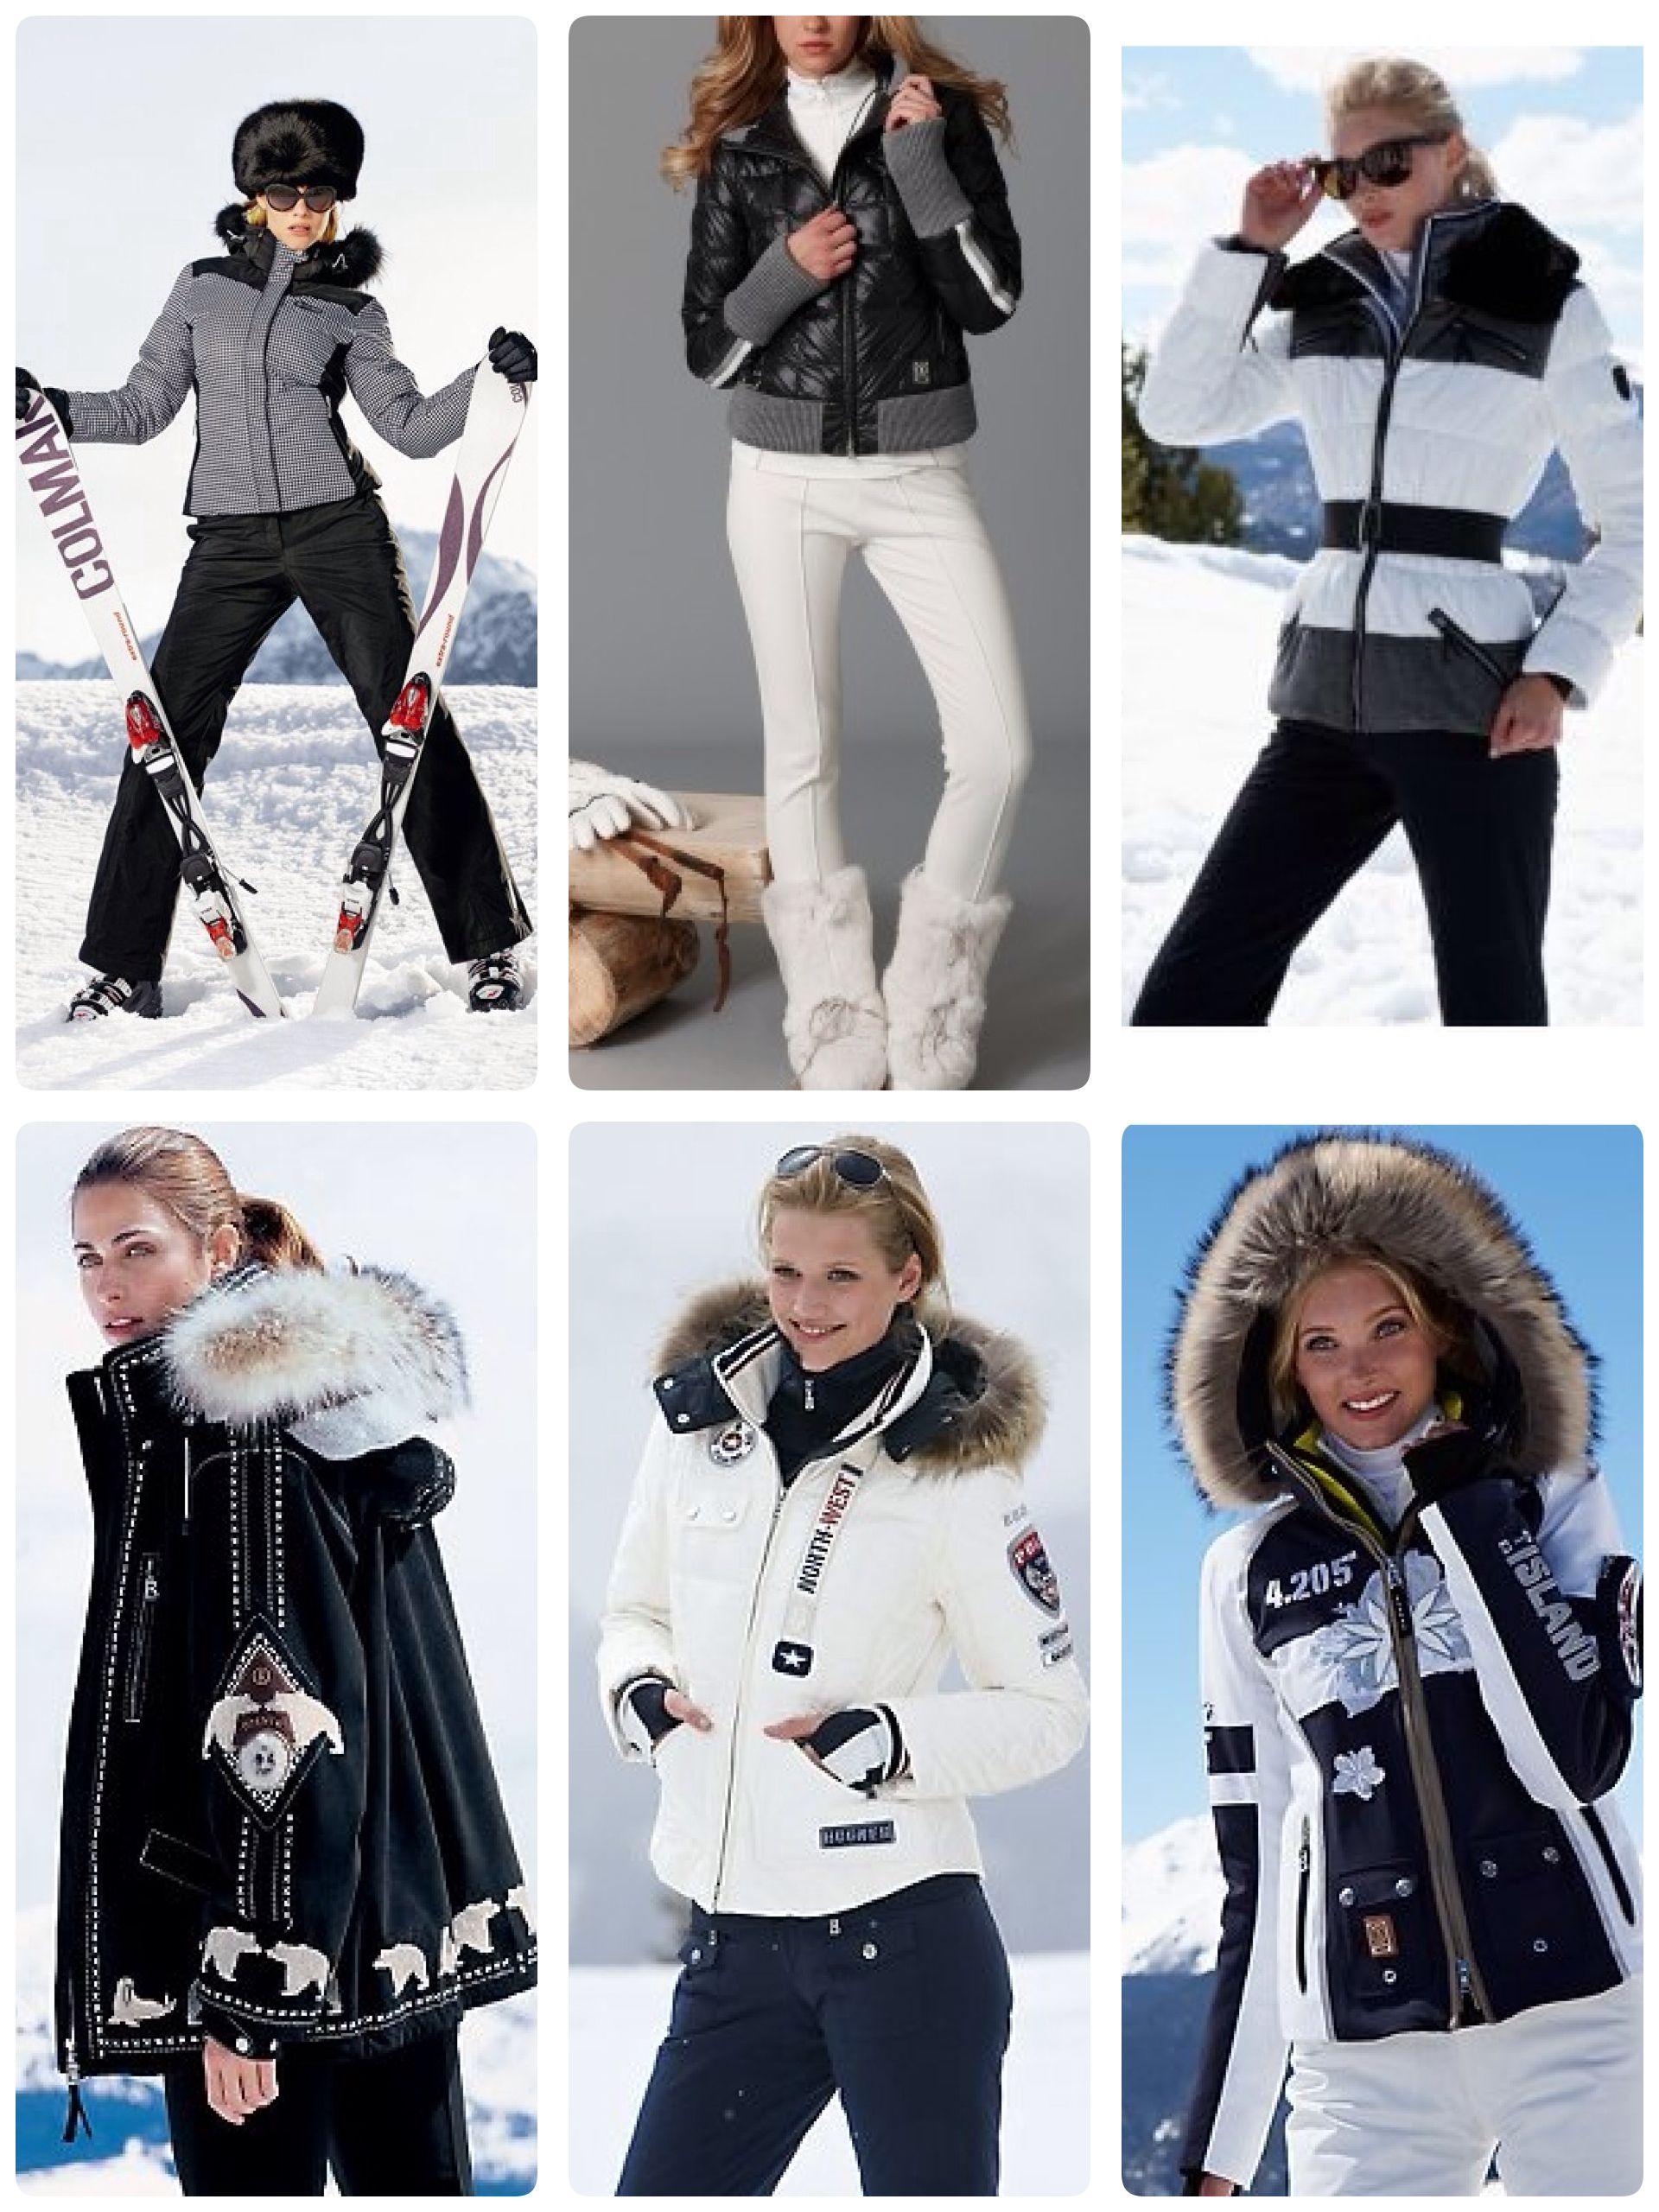 Ropa De Moda Para Esquiar | Fashion Skiing And Apres Ski Style | Pinterest | Tenues De Ski Je ...